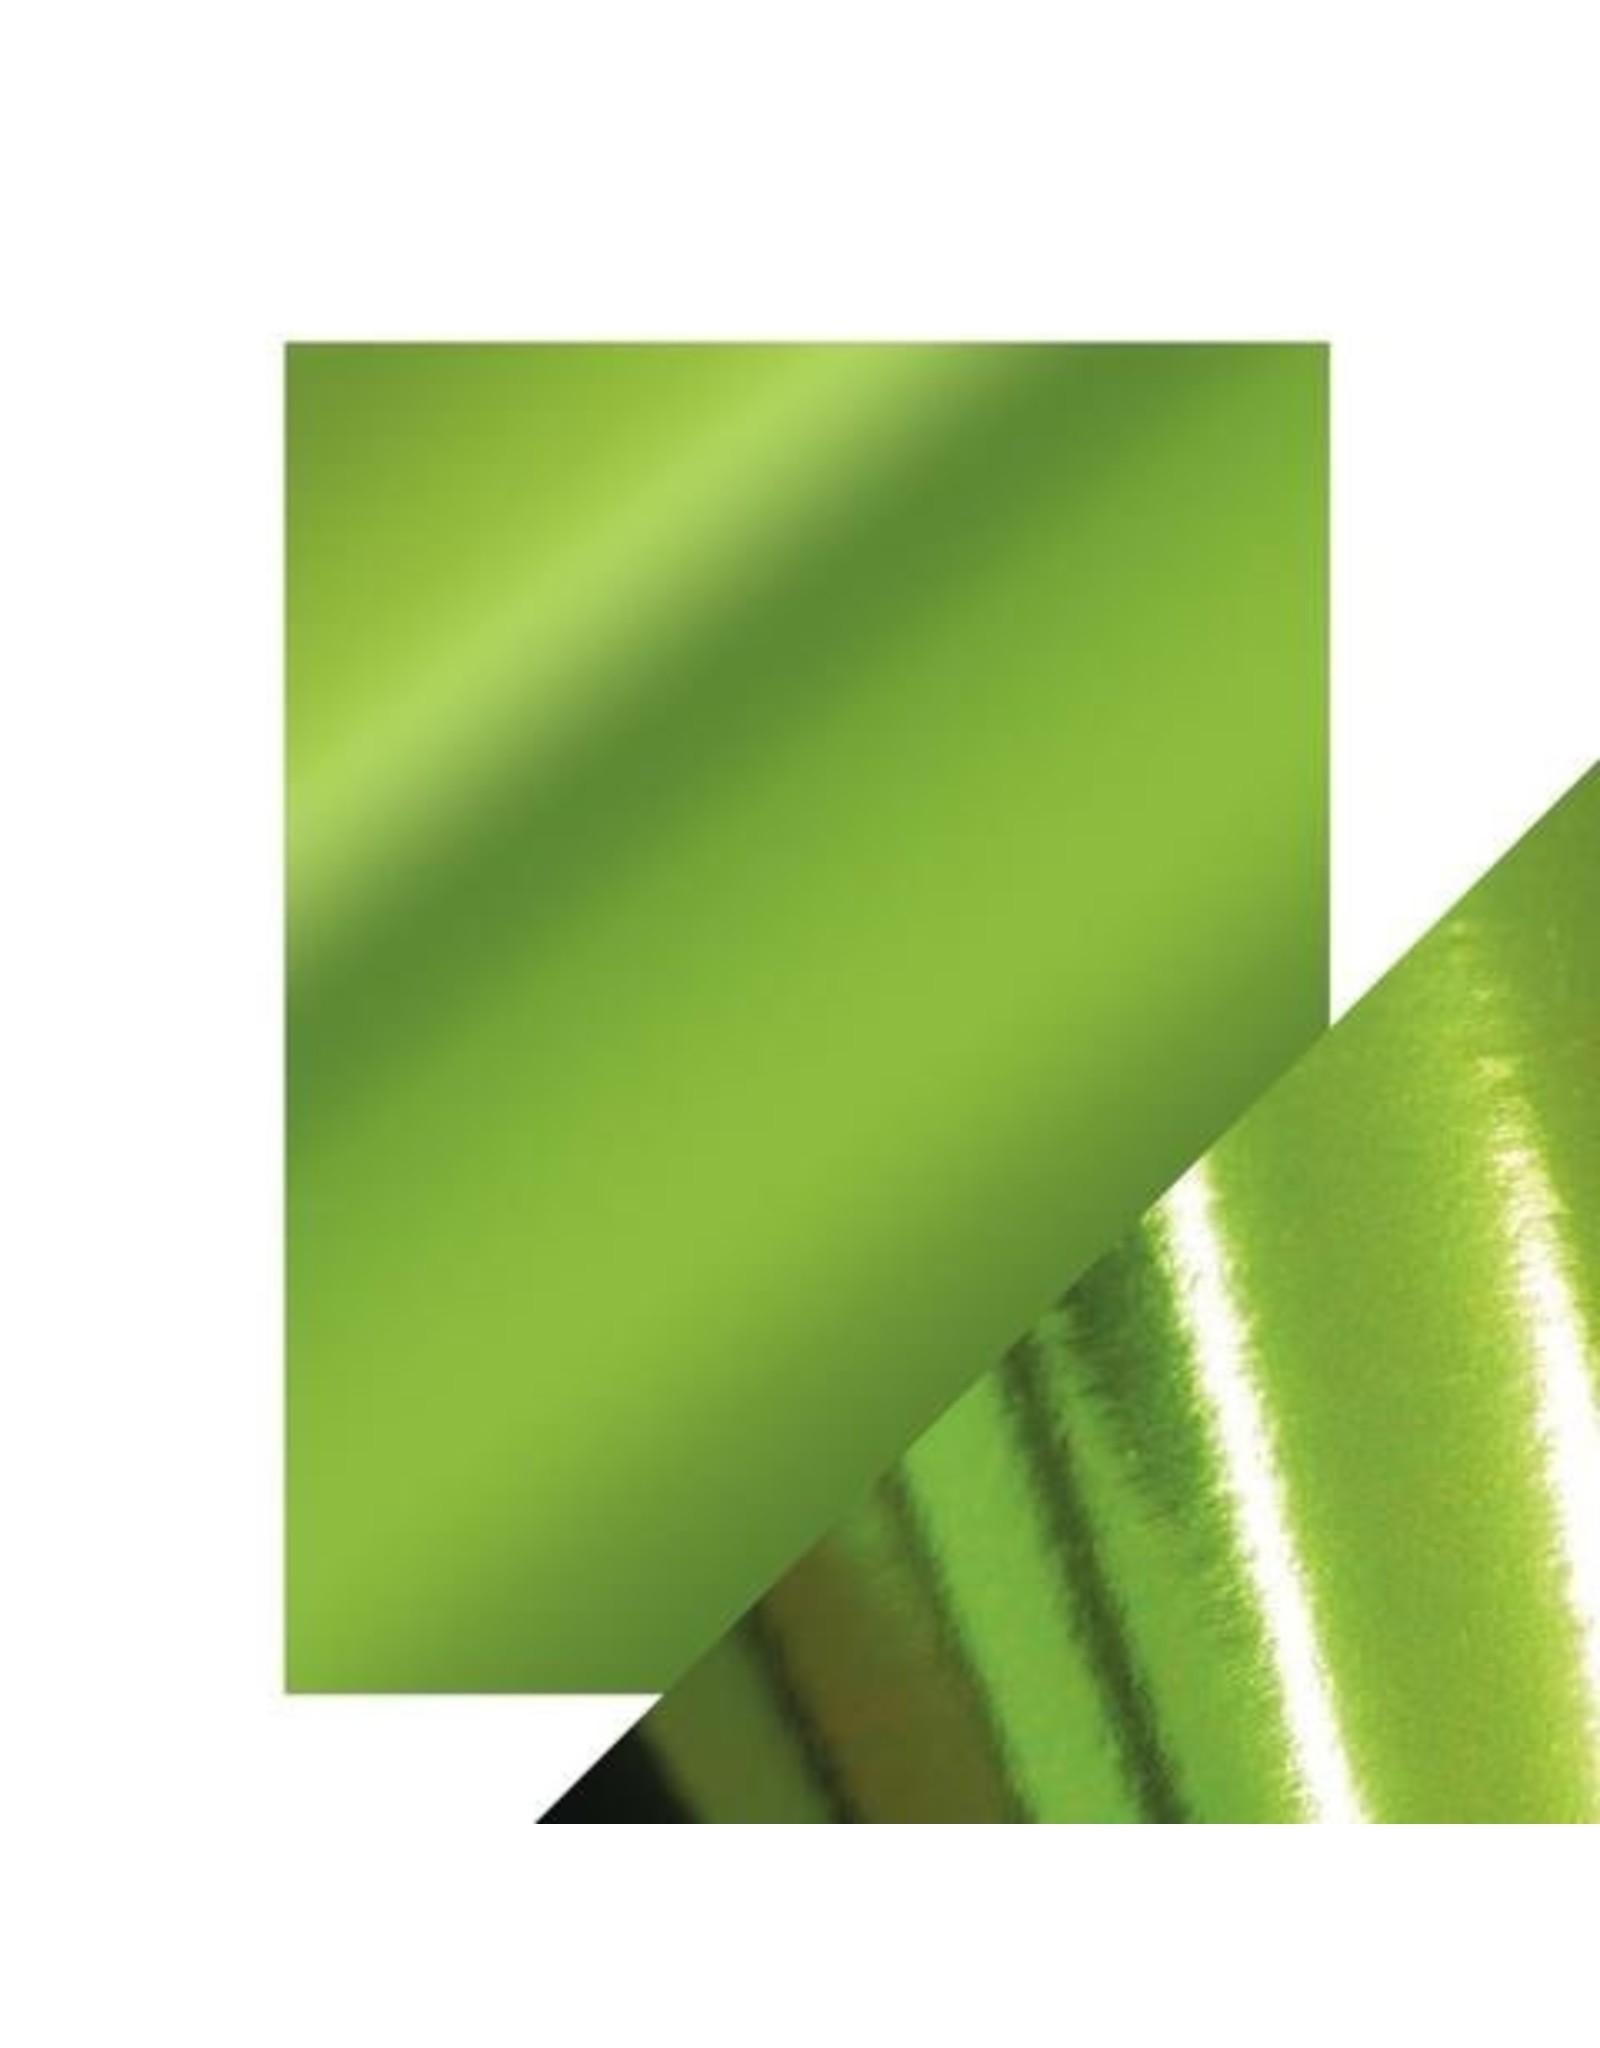 8.5X11 Mirror Cardstock, Gloss - Emerald Green (5/Pk)